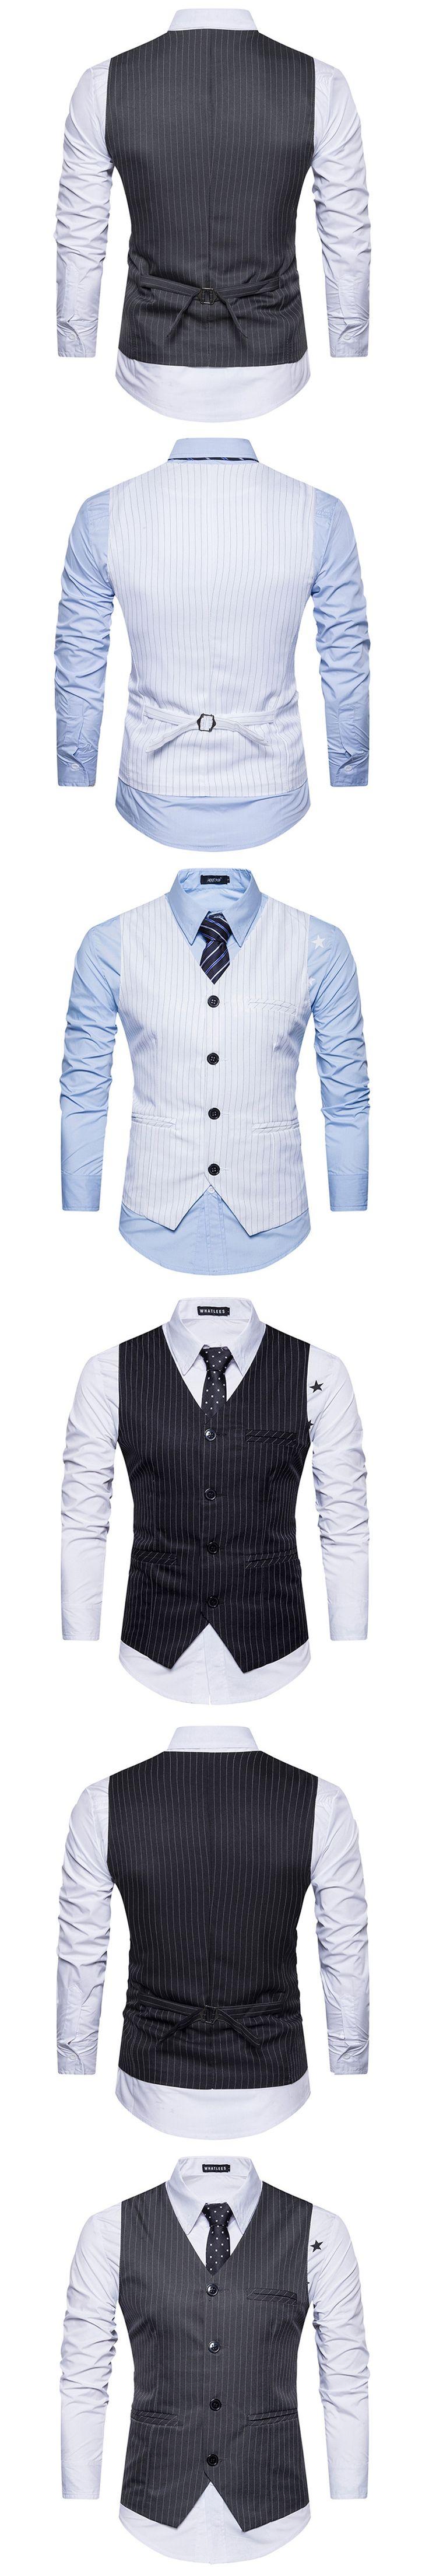 2017 Men's Formal Business Casual Dress Vest Suit Slim Fit Tuxedo Waistcoat Coat Gilet Jacket Outwear Tops Meeting Stripe Black